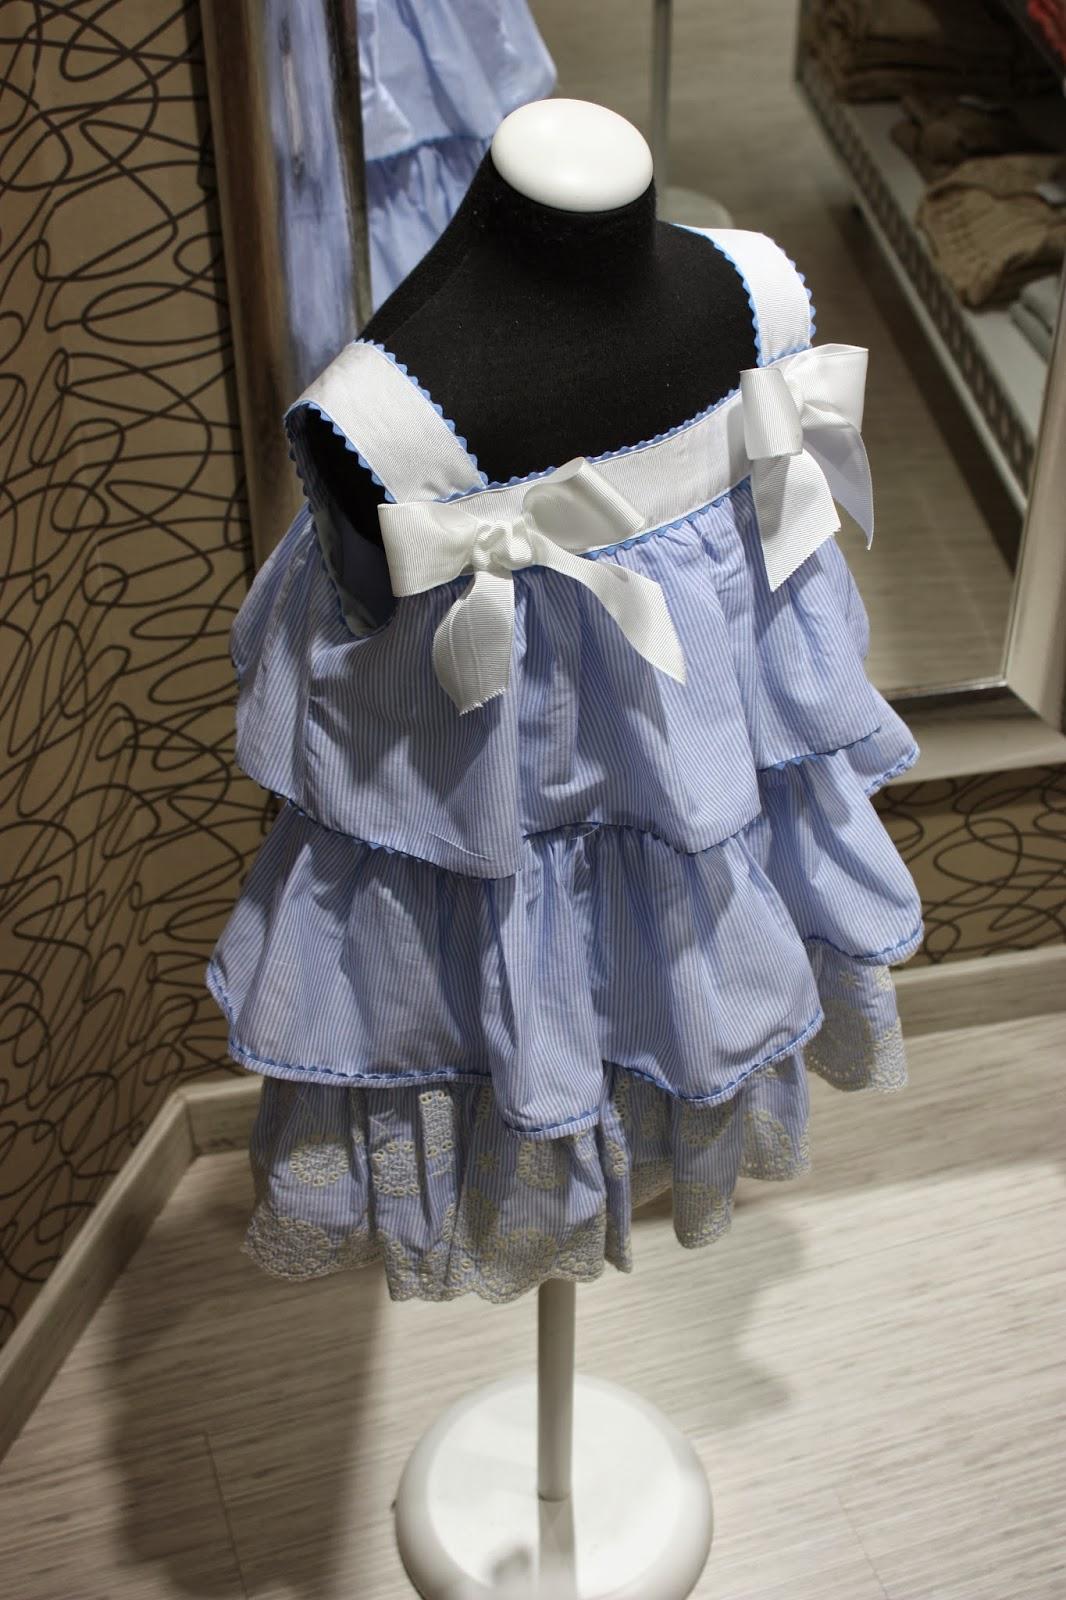 Vestido azul da lomba larga - 2 part 5